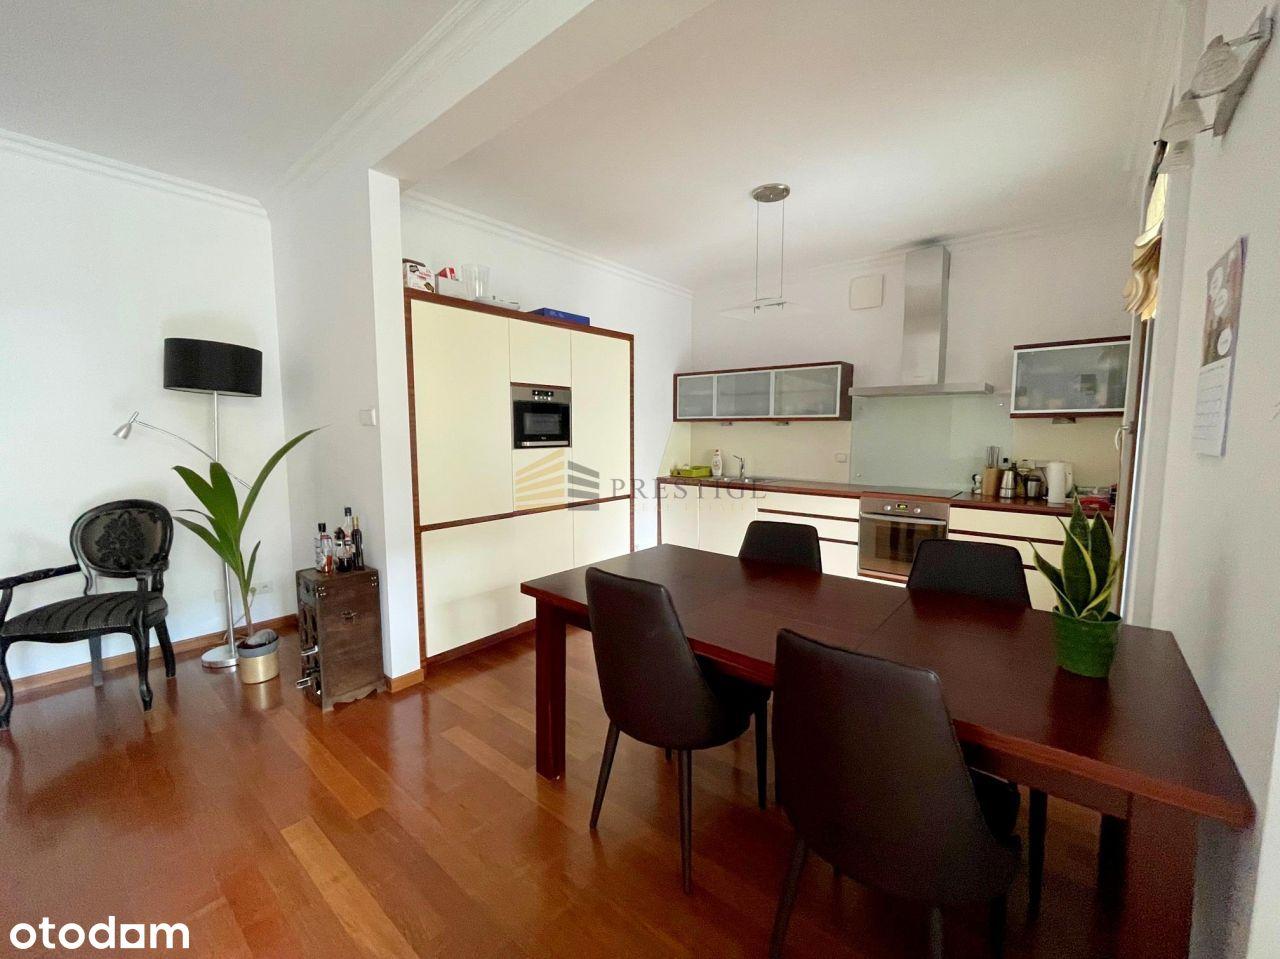 Cozy apartment&Prestigious compound&Security 24/7